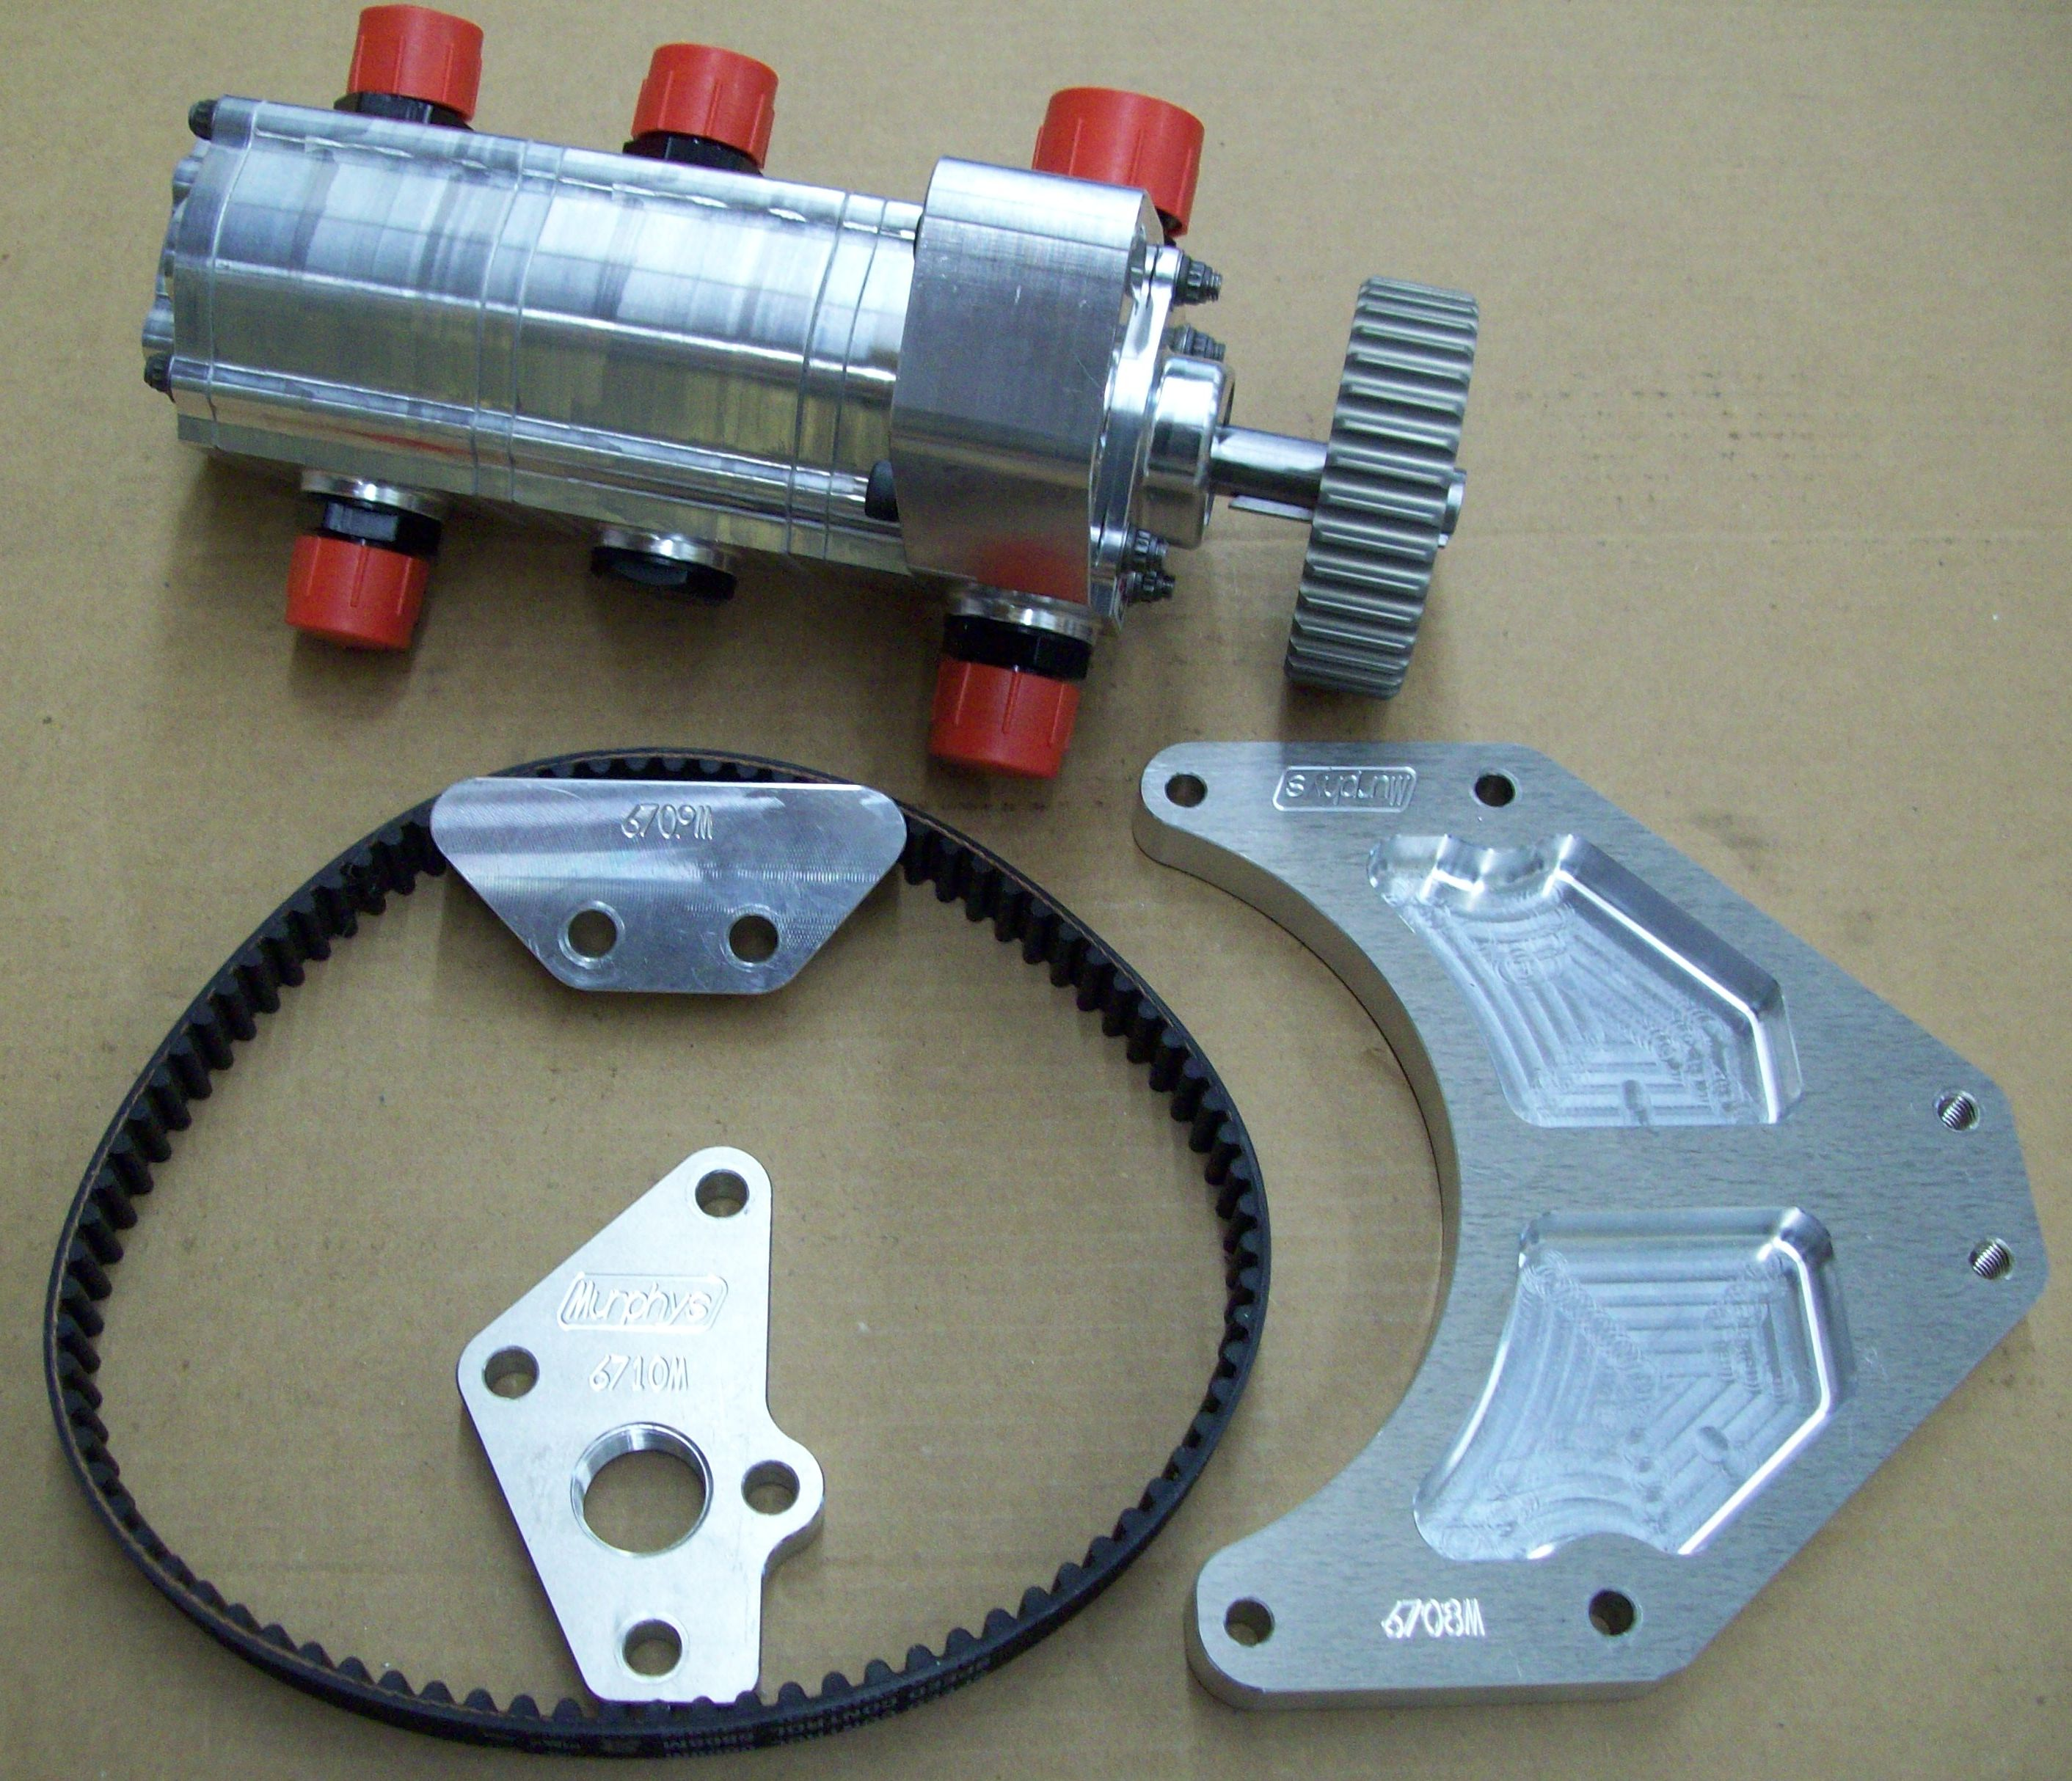 farmall c engine diagram    farmall    h stroker motor simplexstyle com     farmall    h stroker motor simplexstyle com